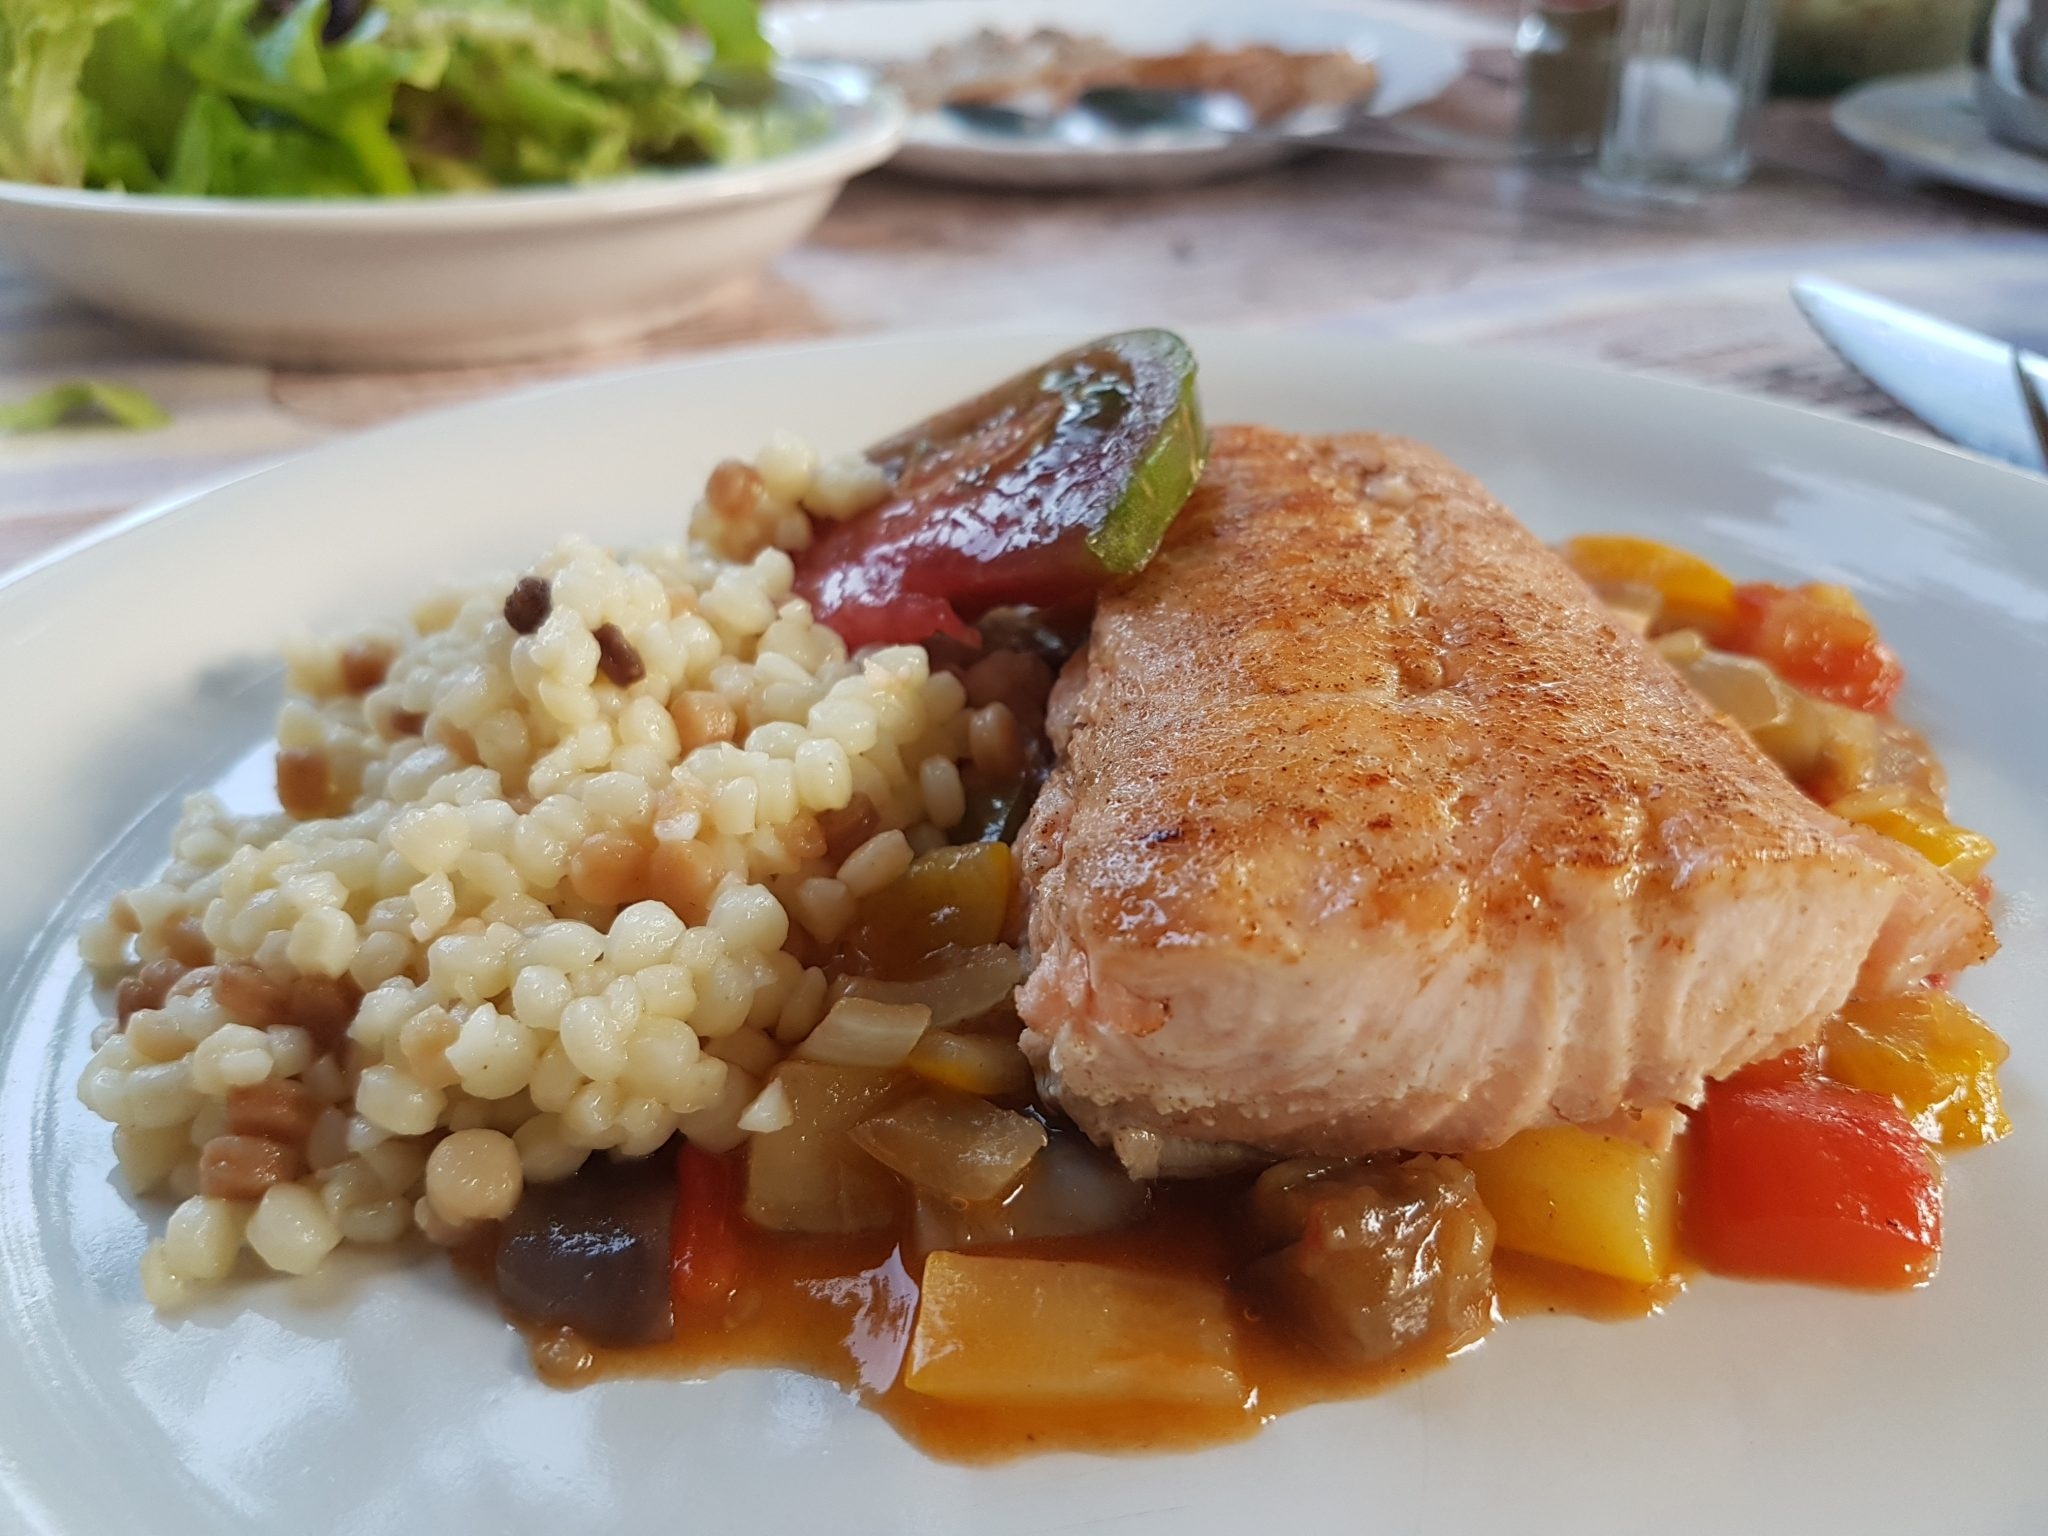 Zalm op een bedje van ratatouille en fregula tostata fina